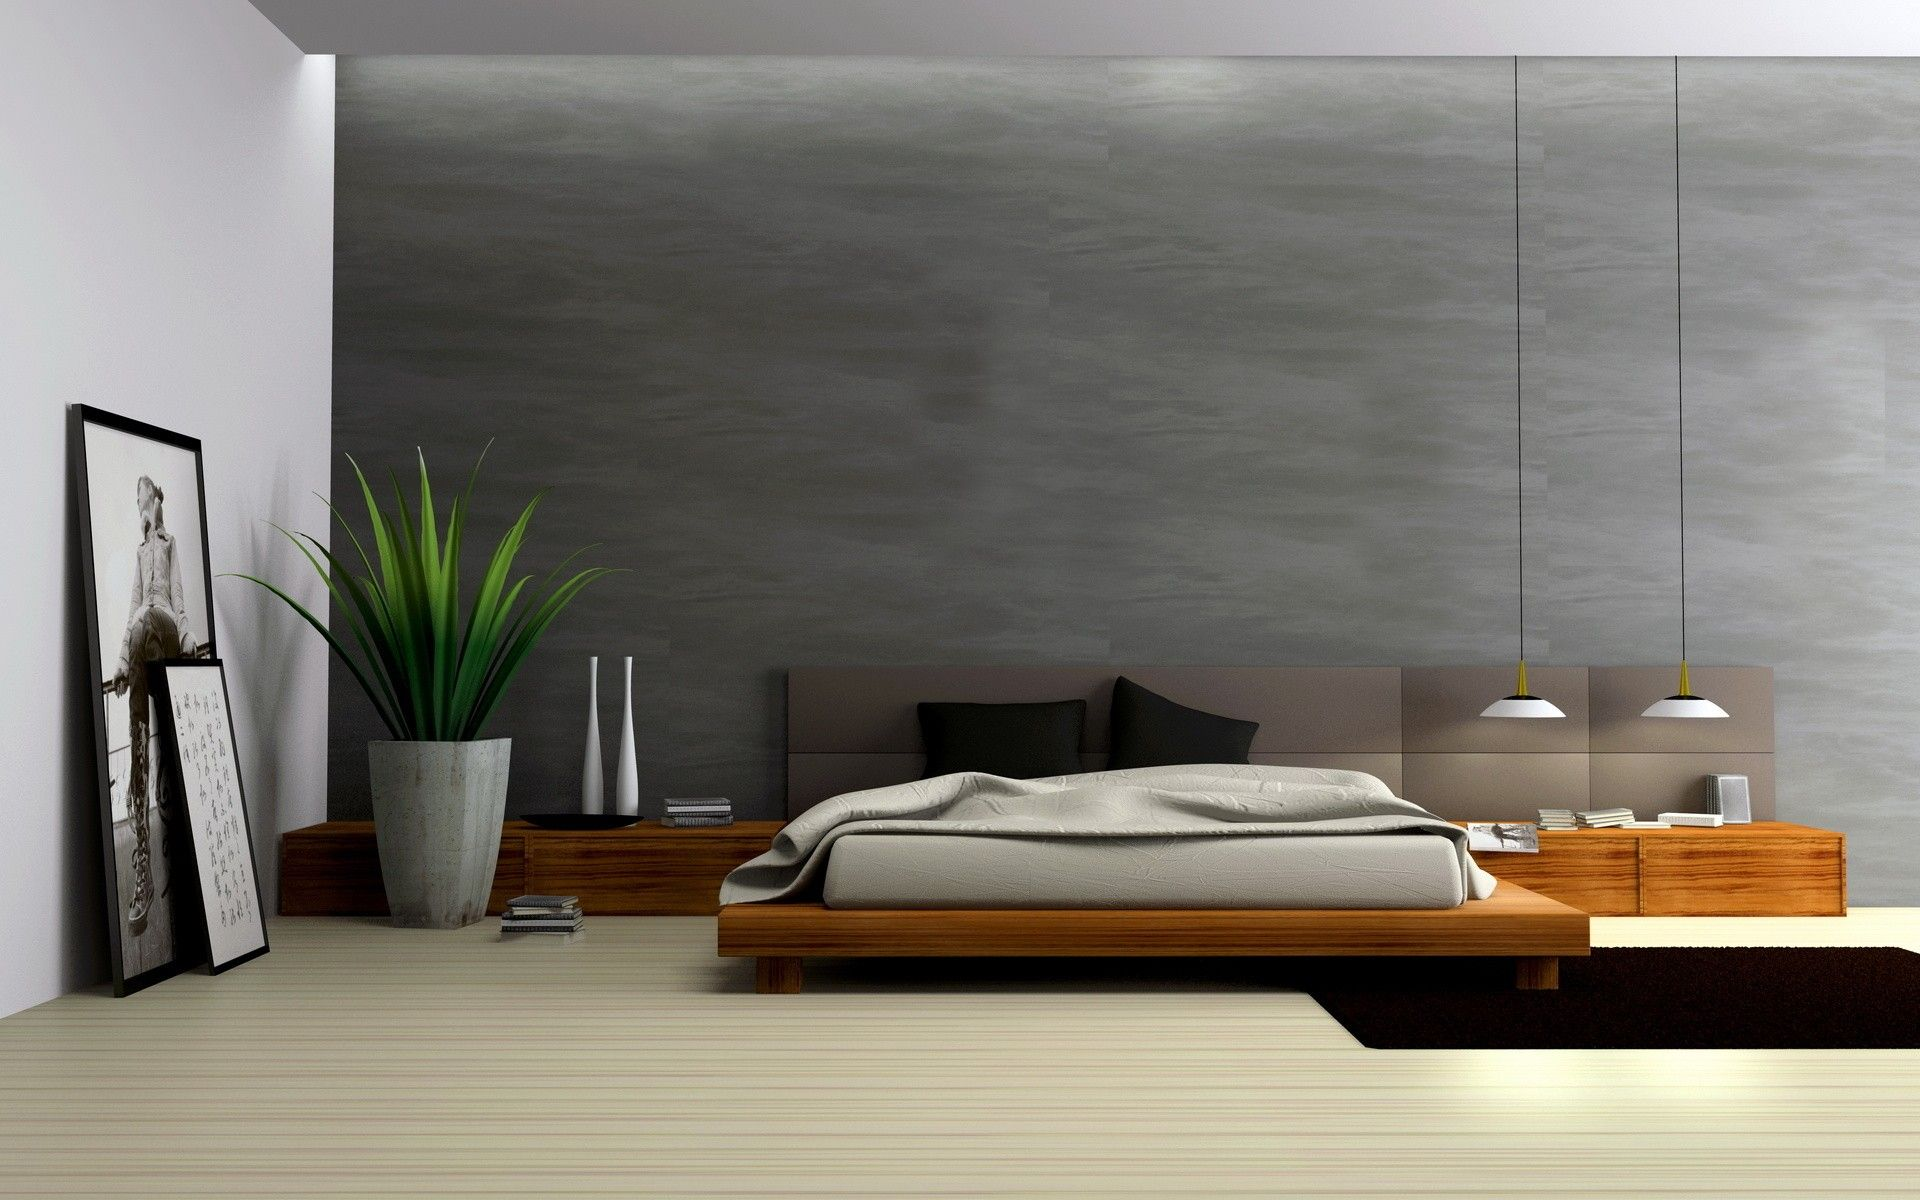 architecture room interior bedroom 1920x1200 wallpaper - Architecture Bedroom Designs